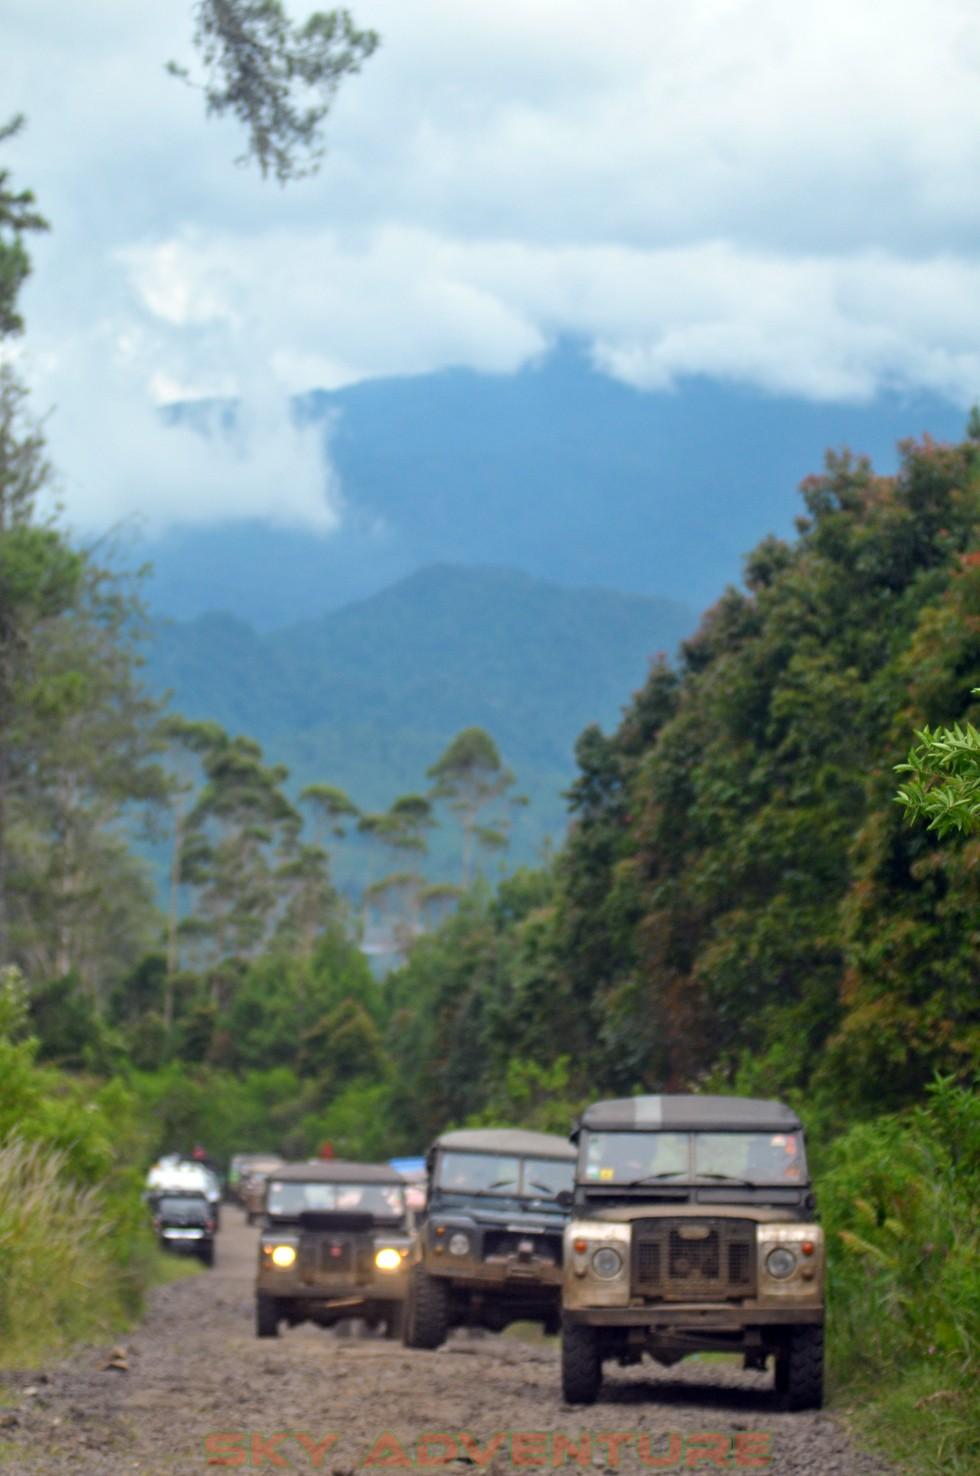 Wisata Offroad di Pangalengan jawa barat, Outbound di Pangalengan, Outbound Pangalengan, Rafting Pangalengan, Camping Pangalengan